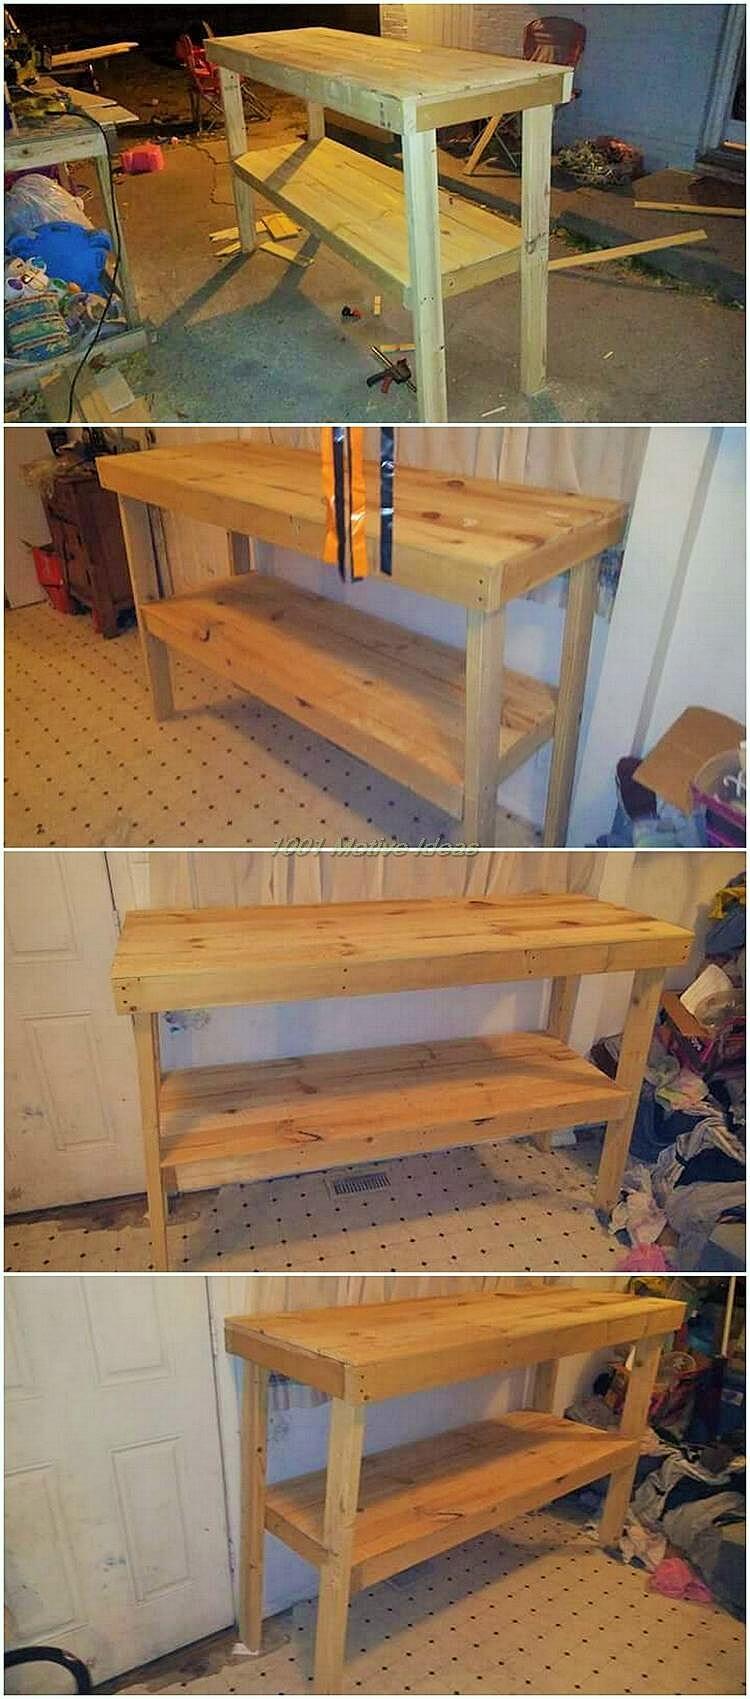 wooden-Pallet-Kitchen-furniture-Project-Ideas-003